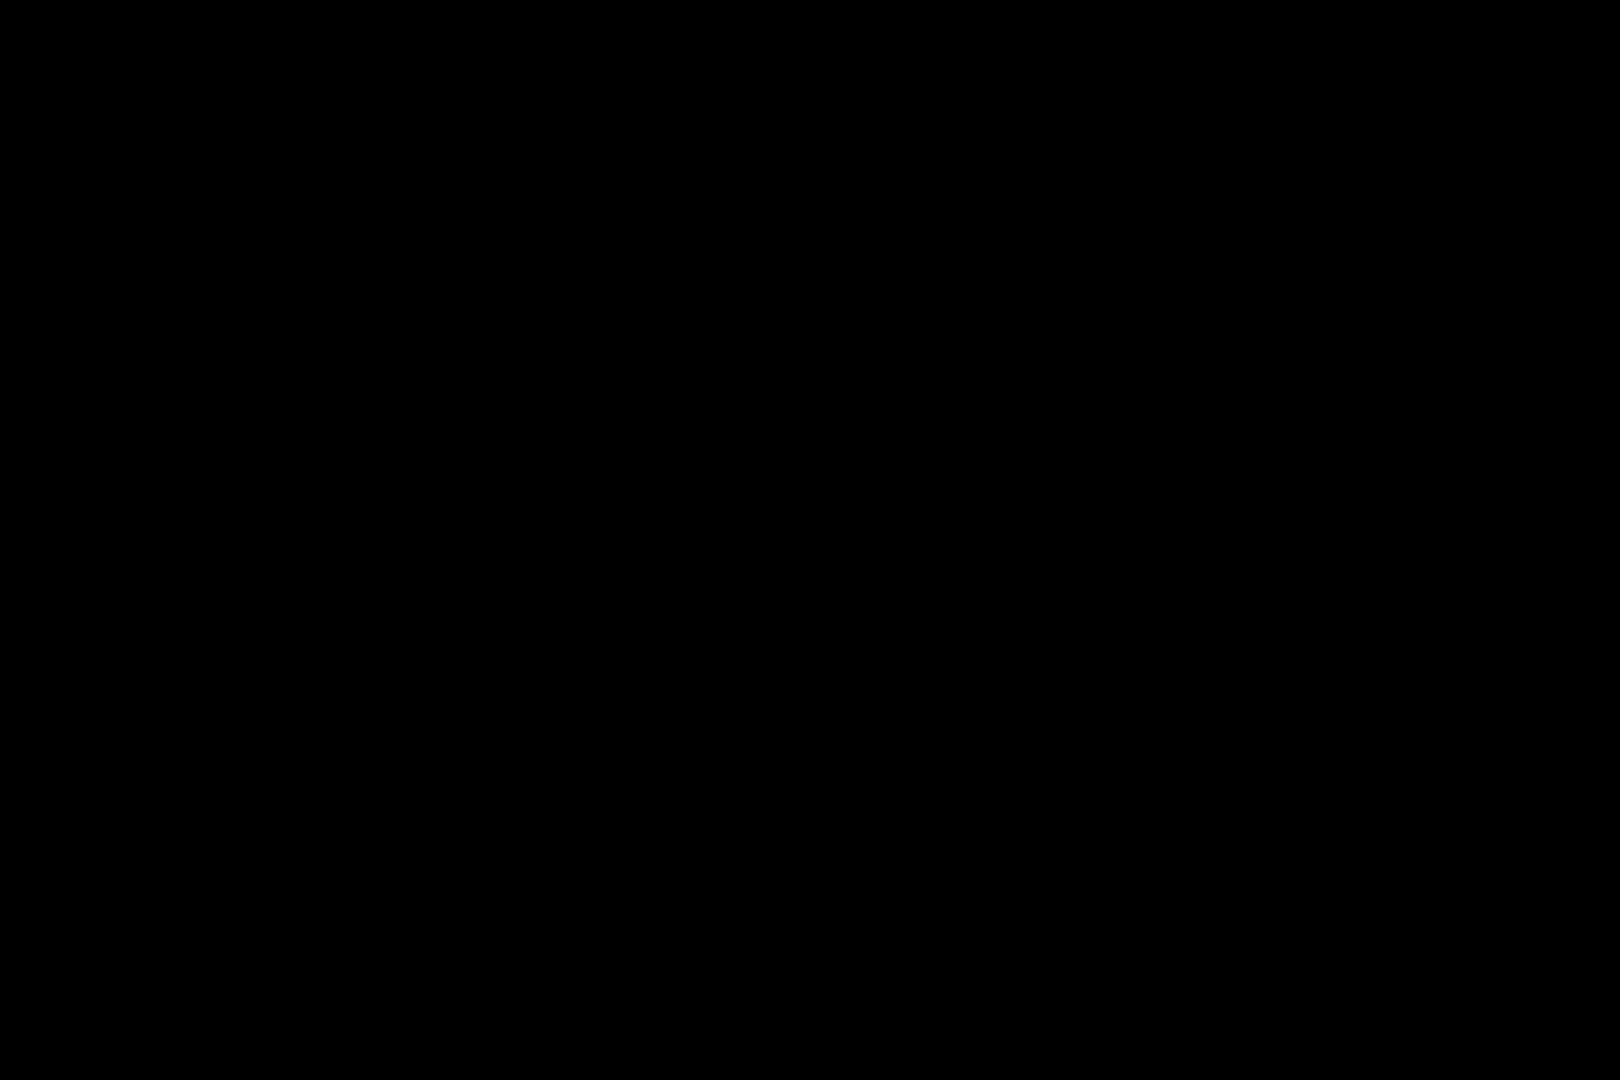 充血監督の深夜の運動会Vol.144 美女OL  46連発 21